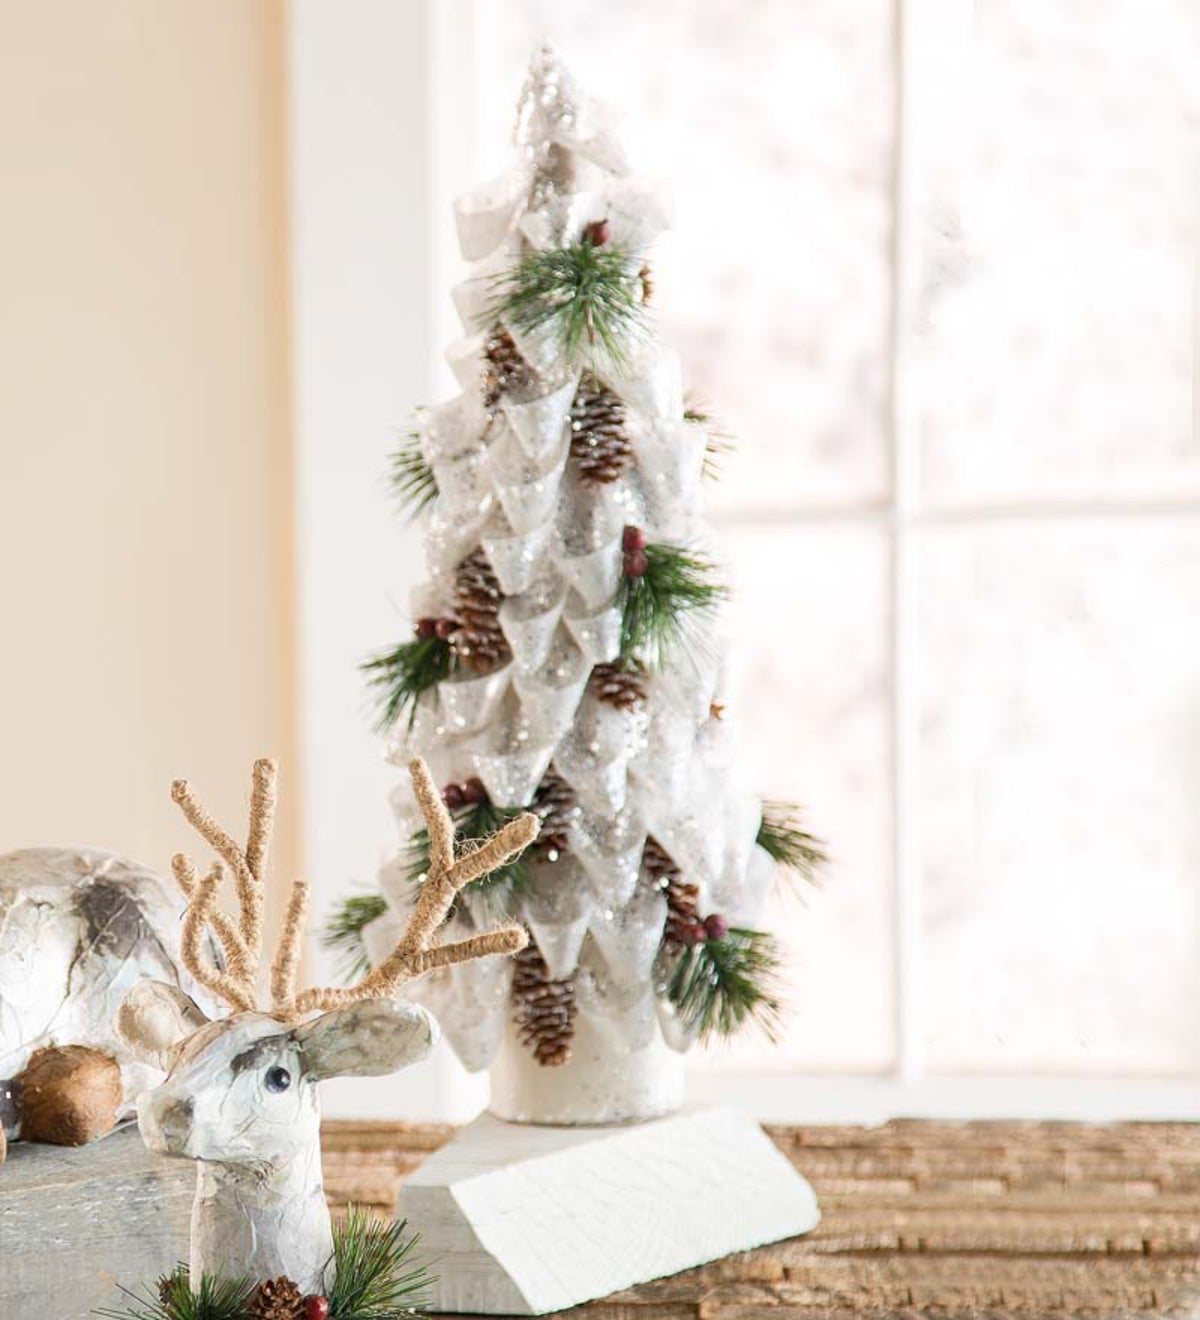 Christmas Trees Ribbon: White Ribbon Table Christmas Tree With Pinecones